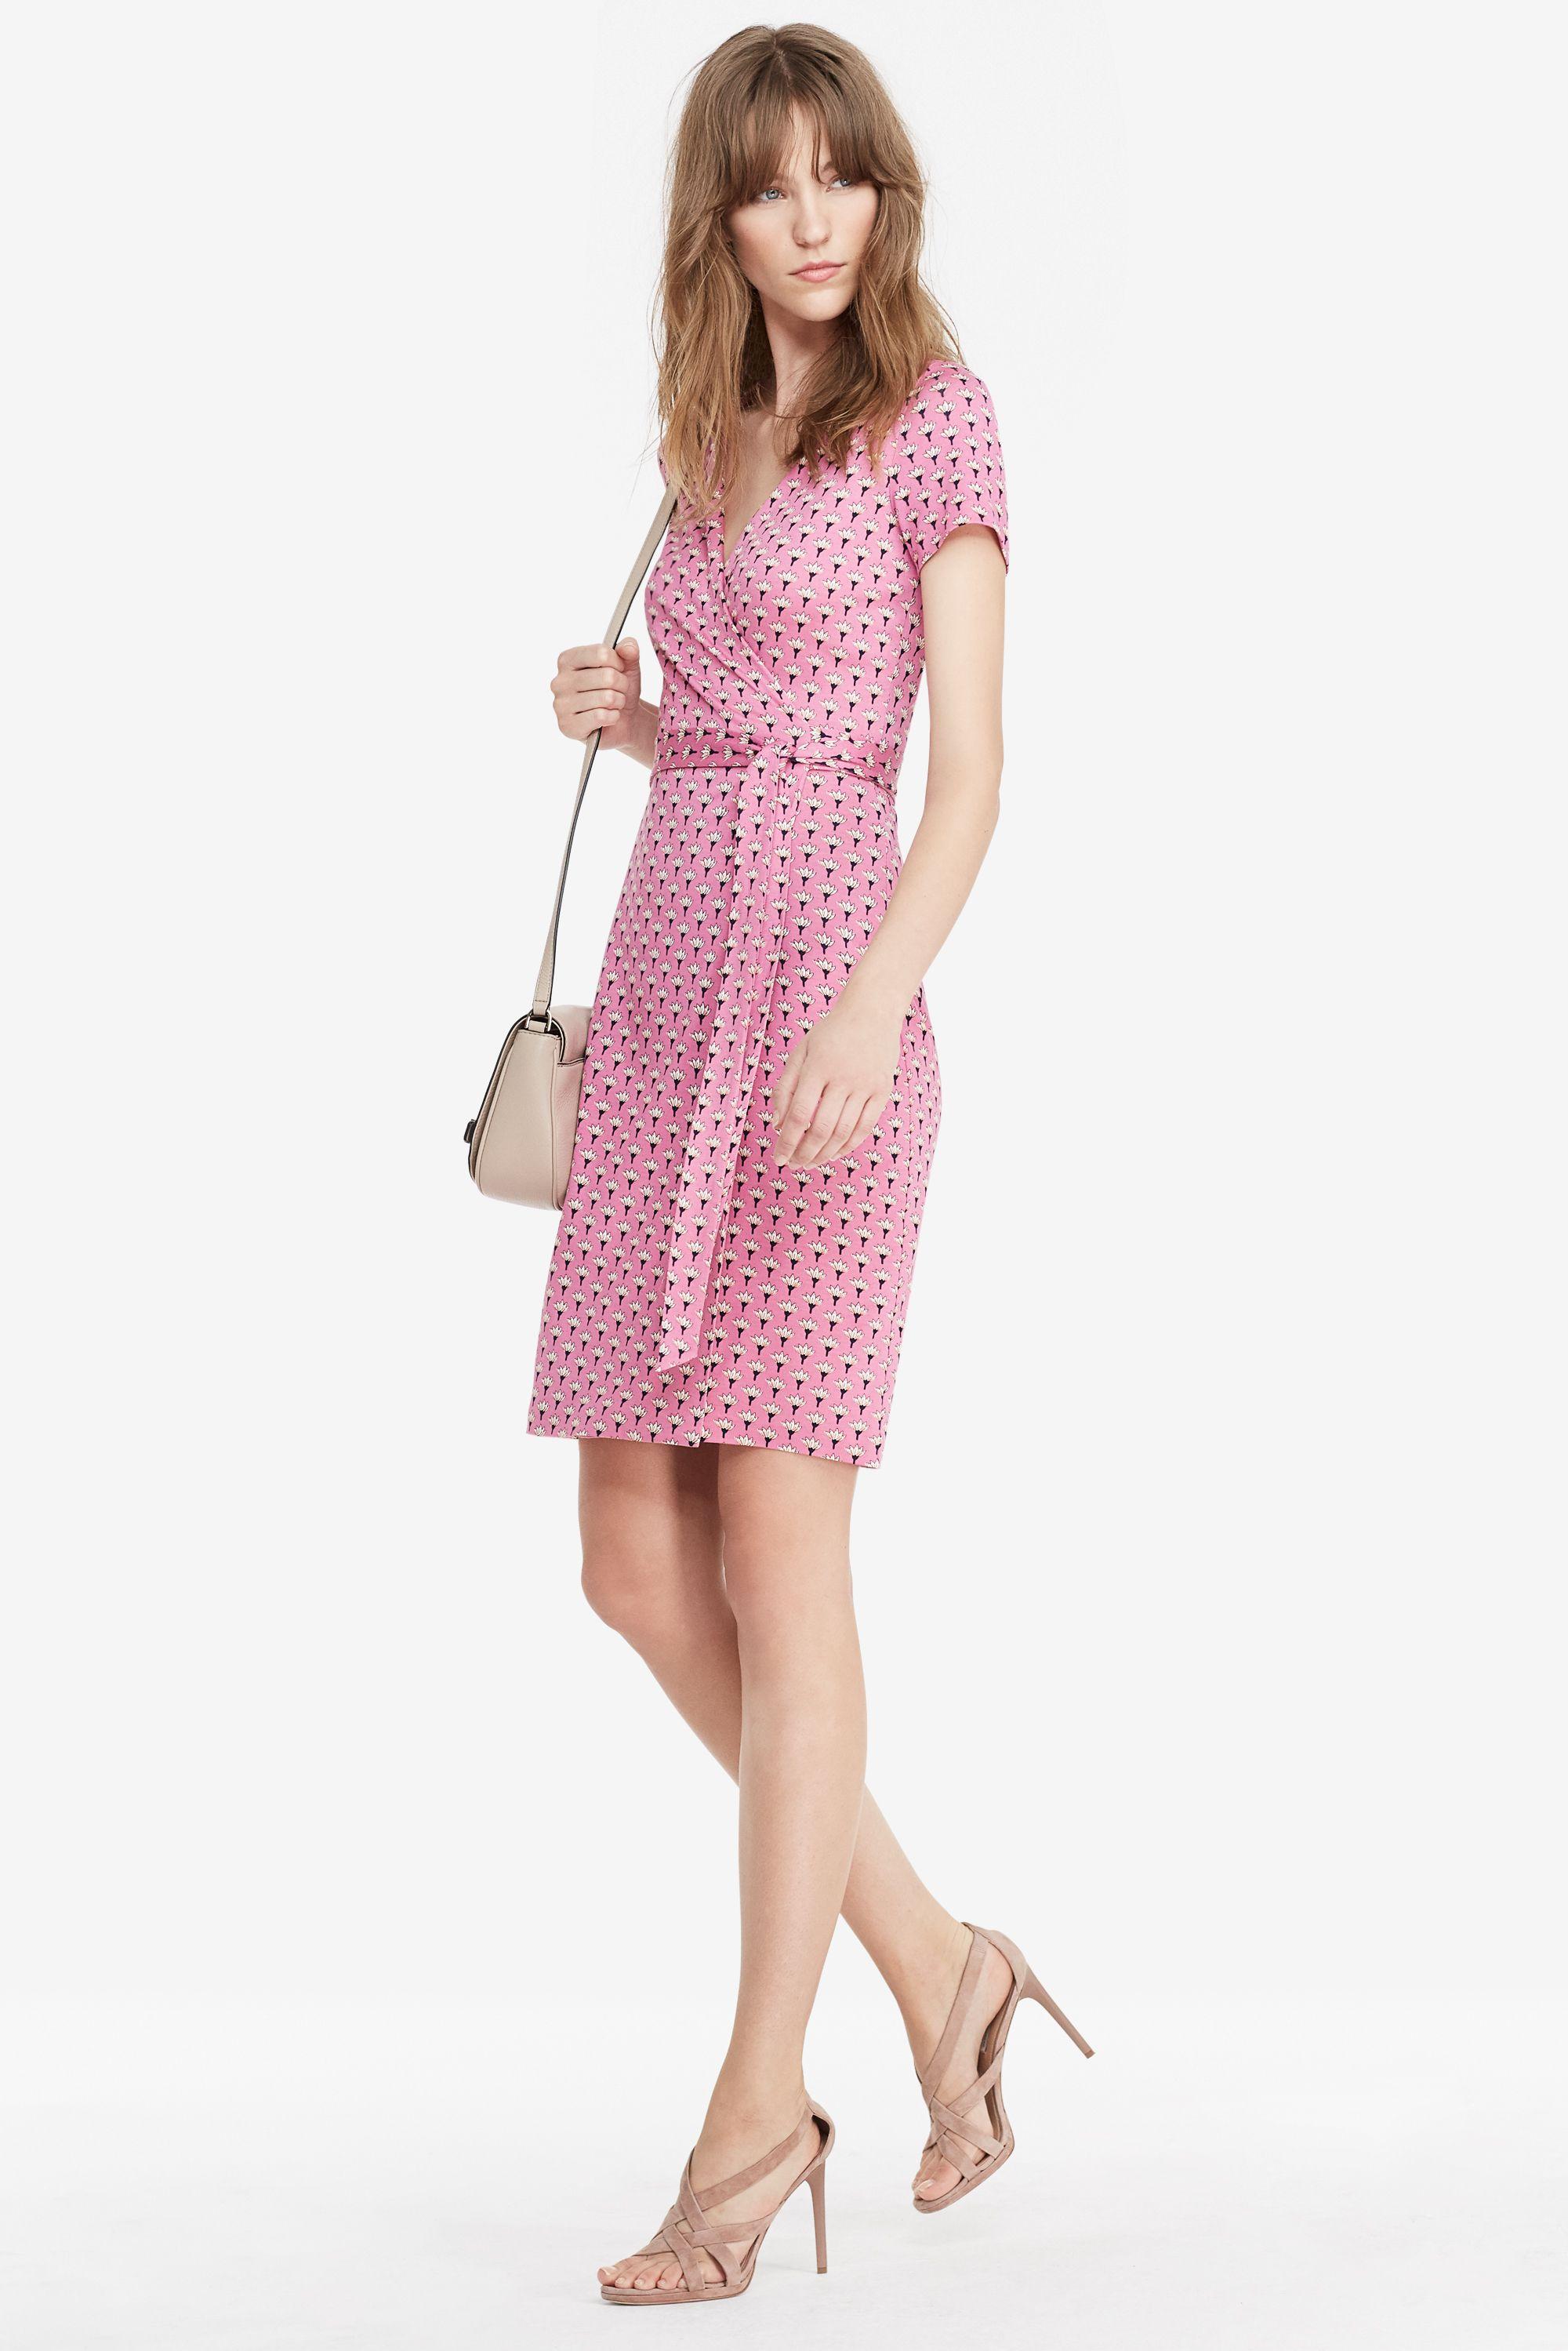 978ed03a7d2 DVF New Julian Two Short Sleeve Silk Jersey Wrap Dress in Peace Palm Pink